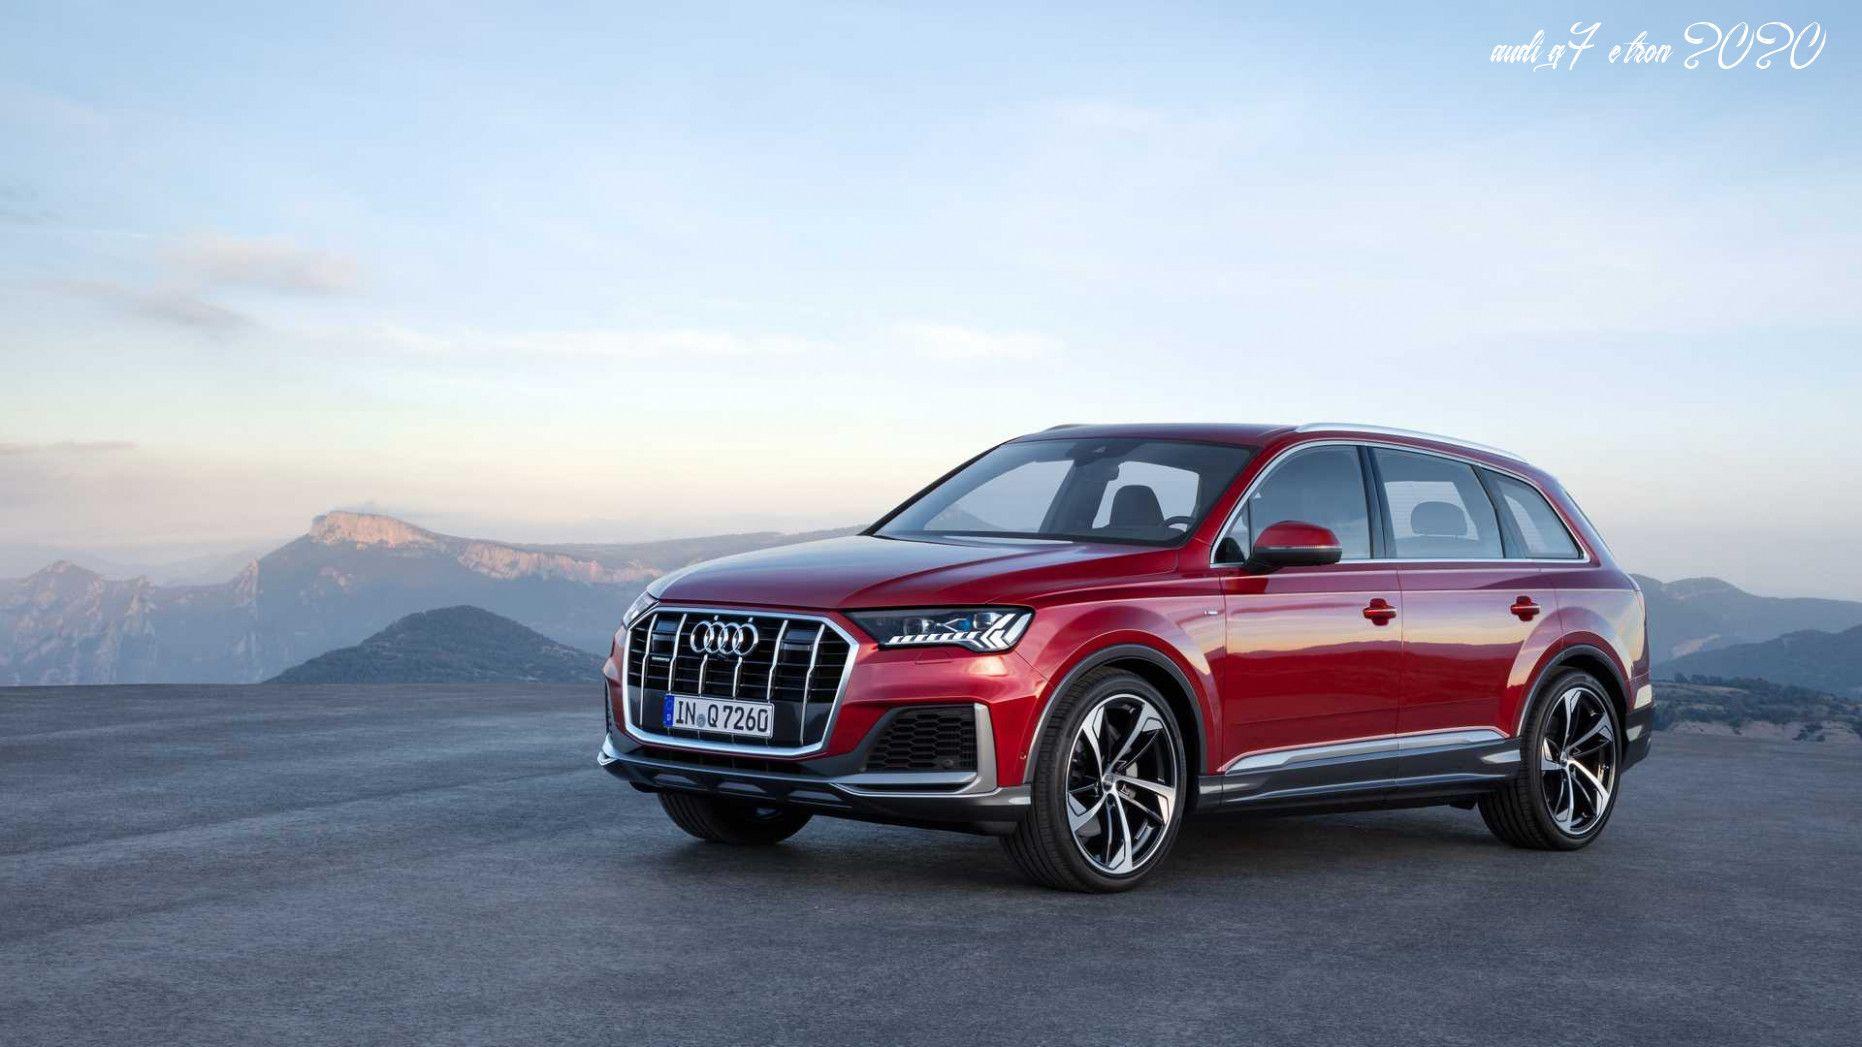 Audi Q7 E Tron 2020 Review And Release Date In 2020 Audi Q7 Audi New Audi Q7